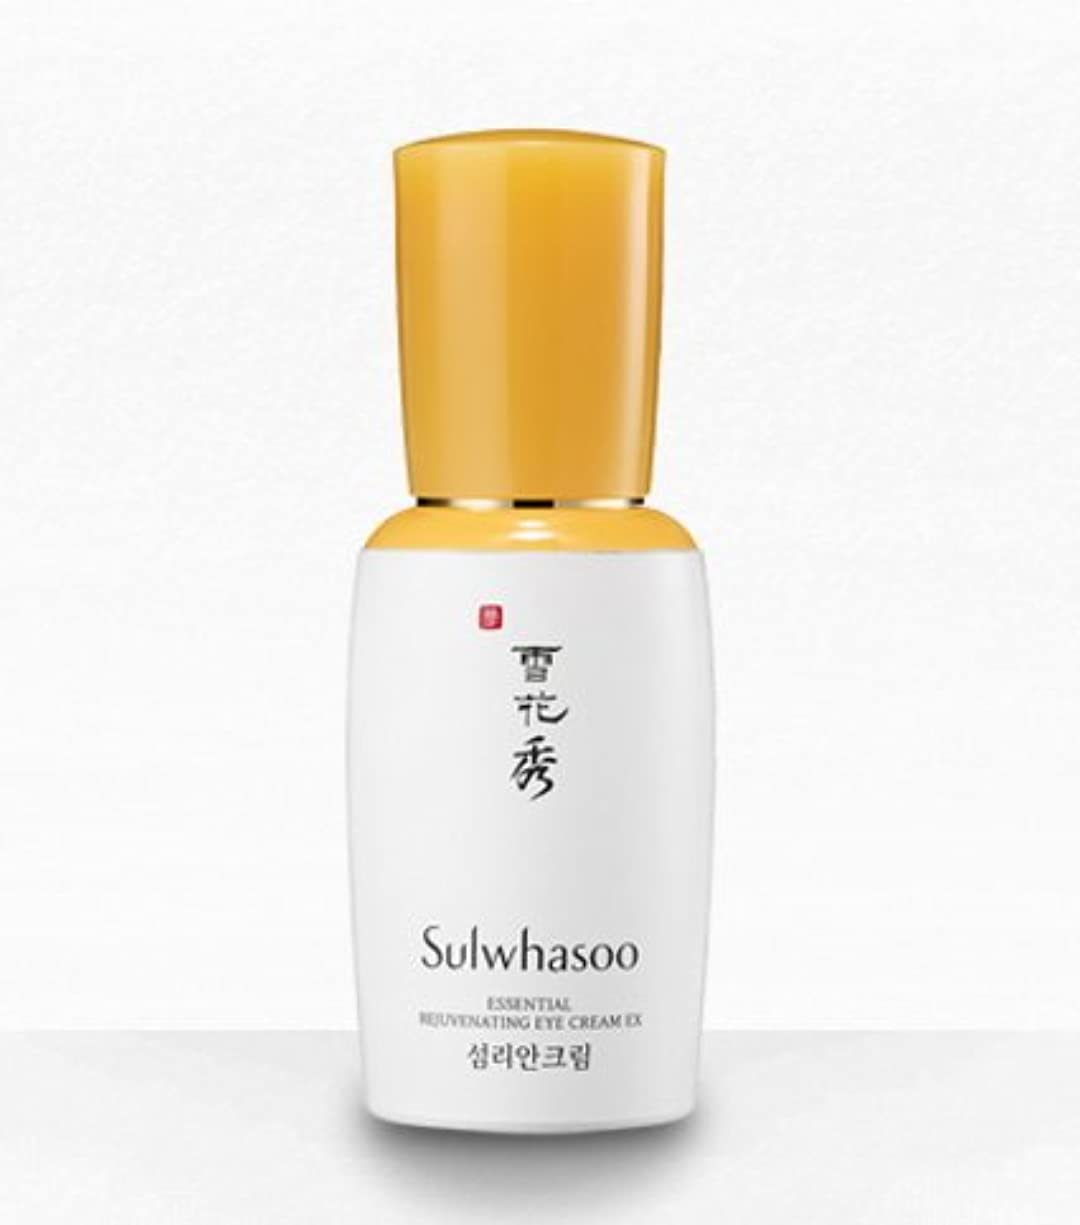 北米花瓶海岸Rejuvenating Eye Cream - Sulwhasoo - Eye Care - 25ml/0.8oz[並行輸入品]